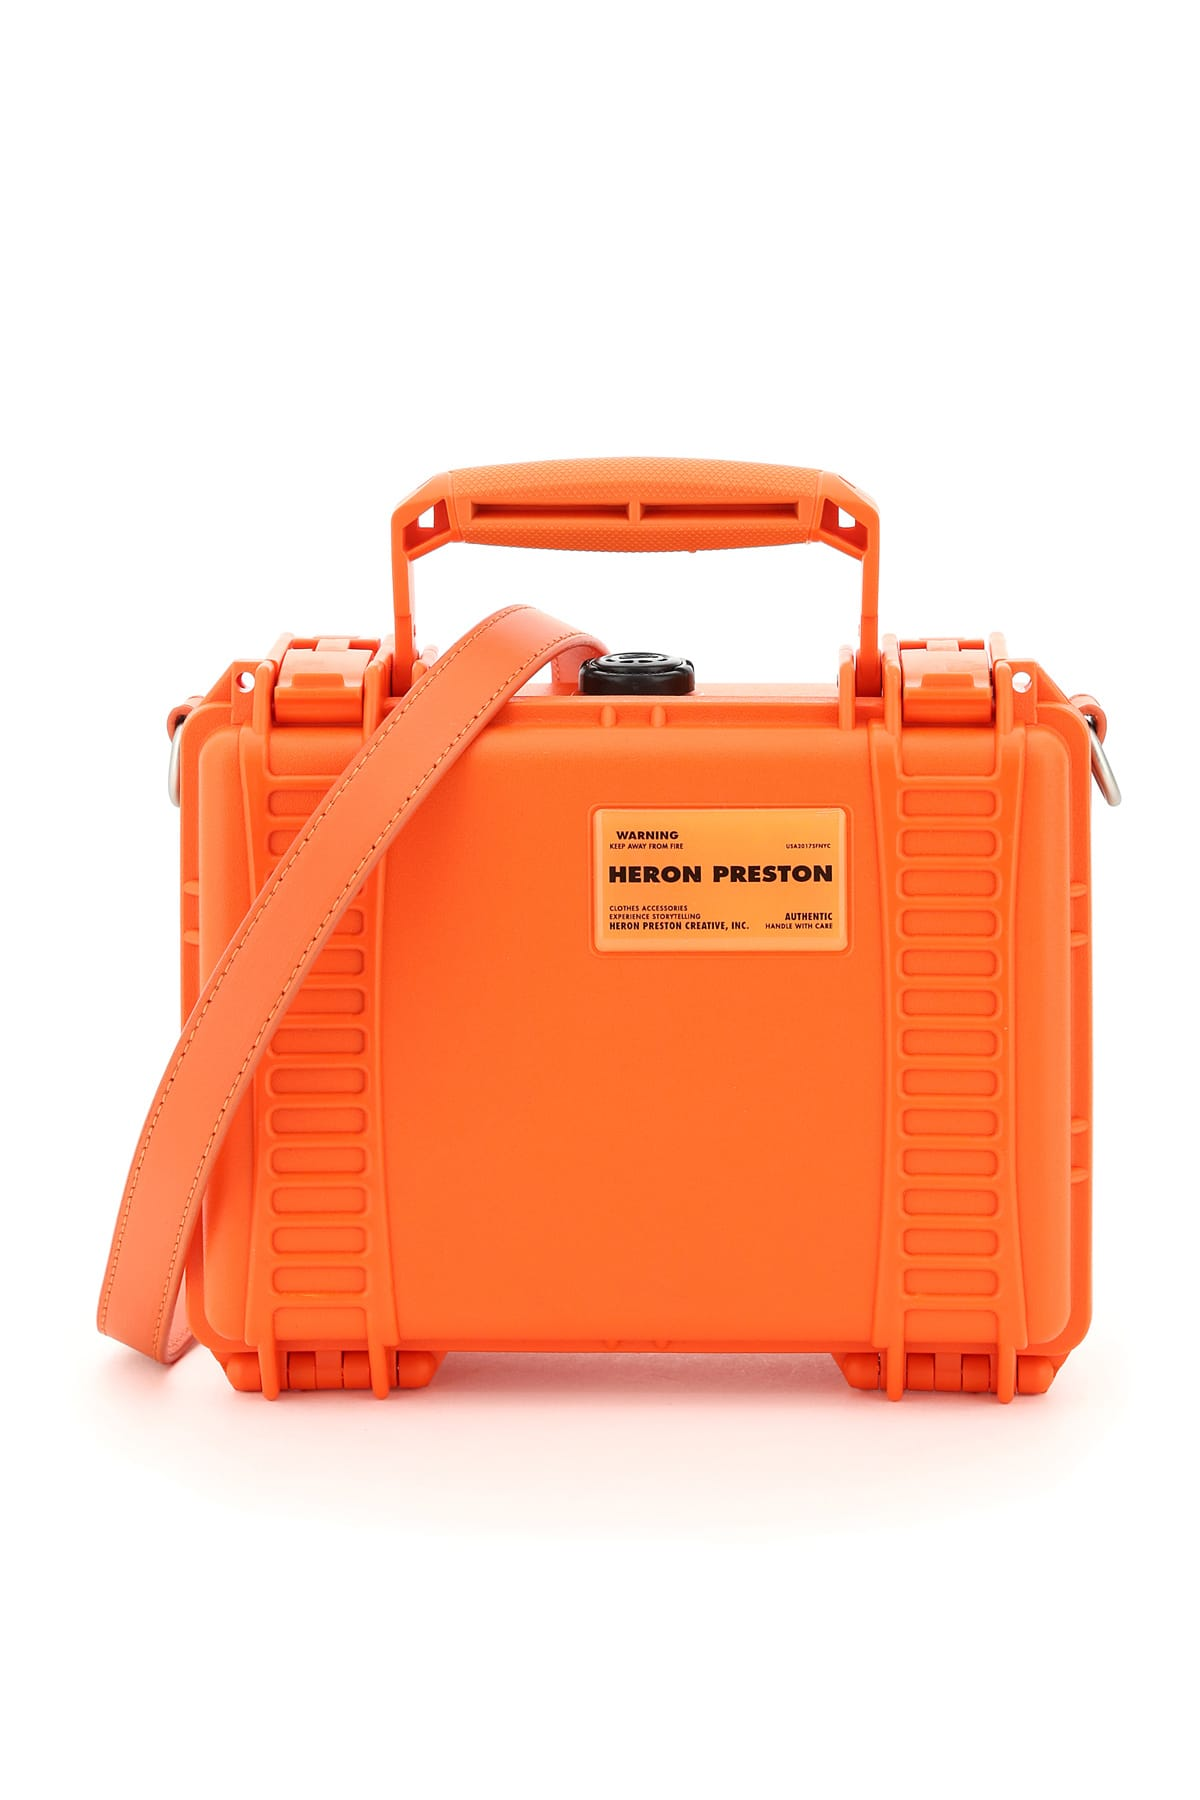 Heron Preston TOOL BOX SHOULDER BAG